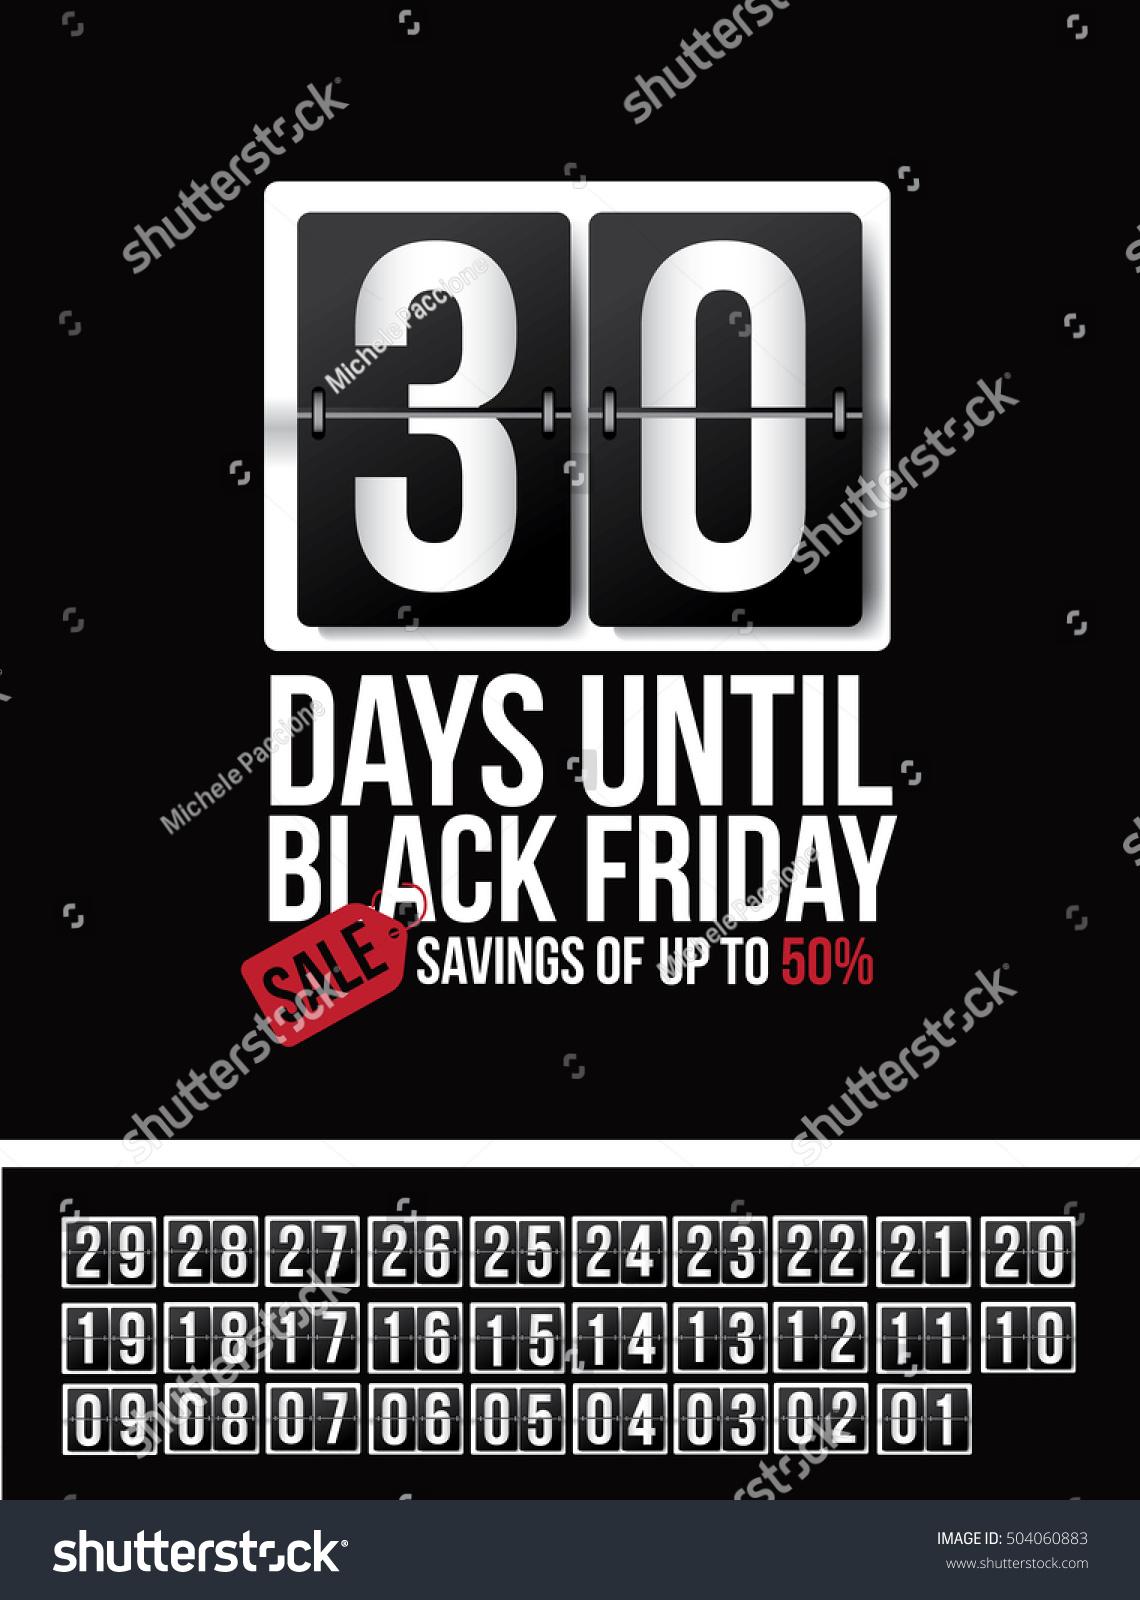 Countdown Black Friday Sale Flip Numbers Stock Vector Royalty Free